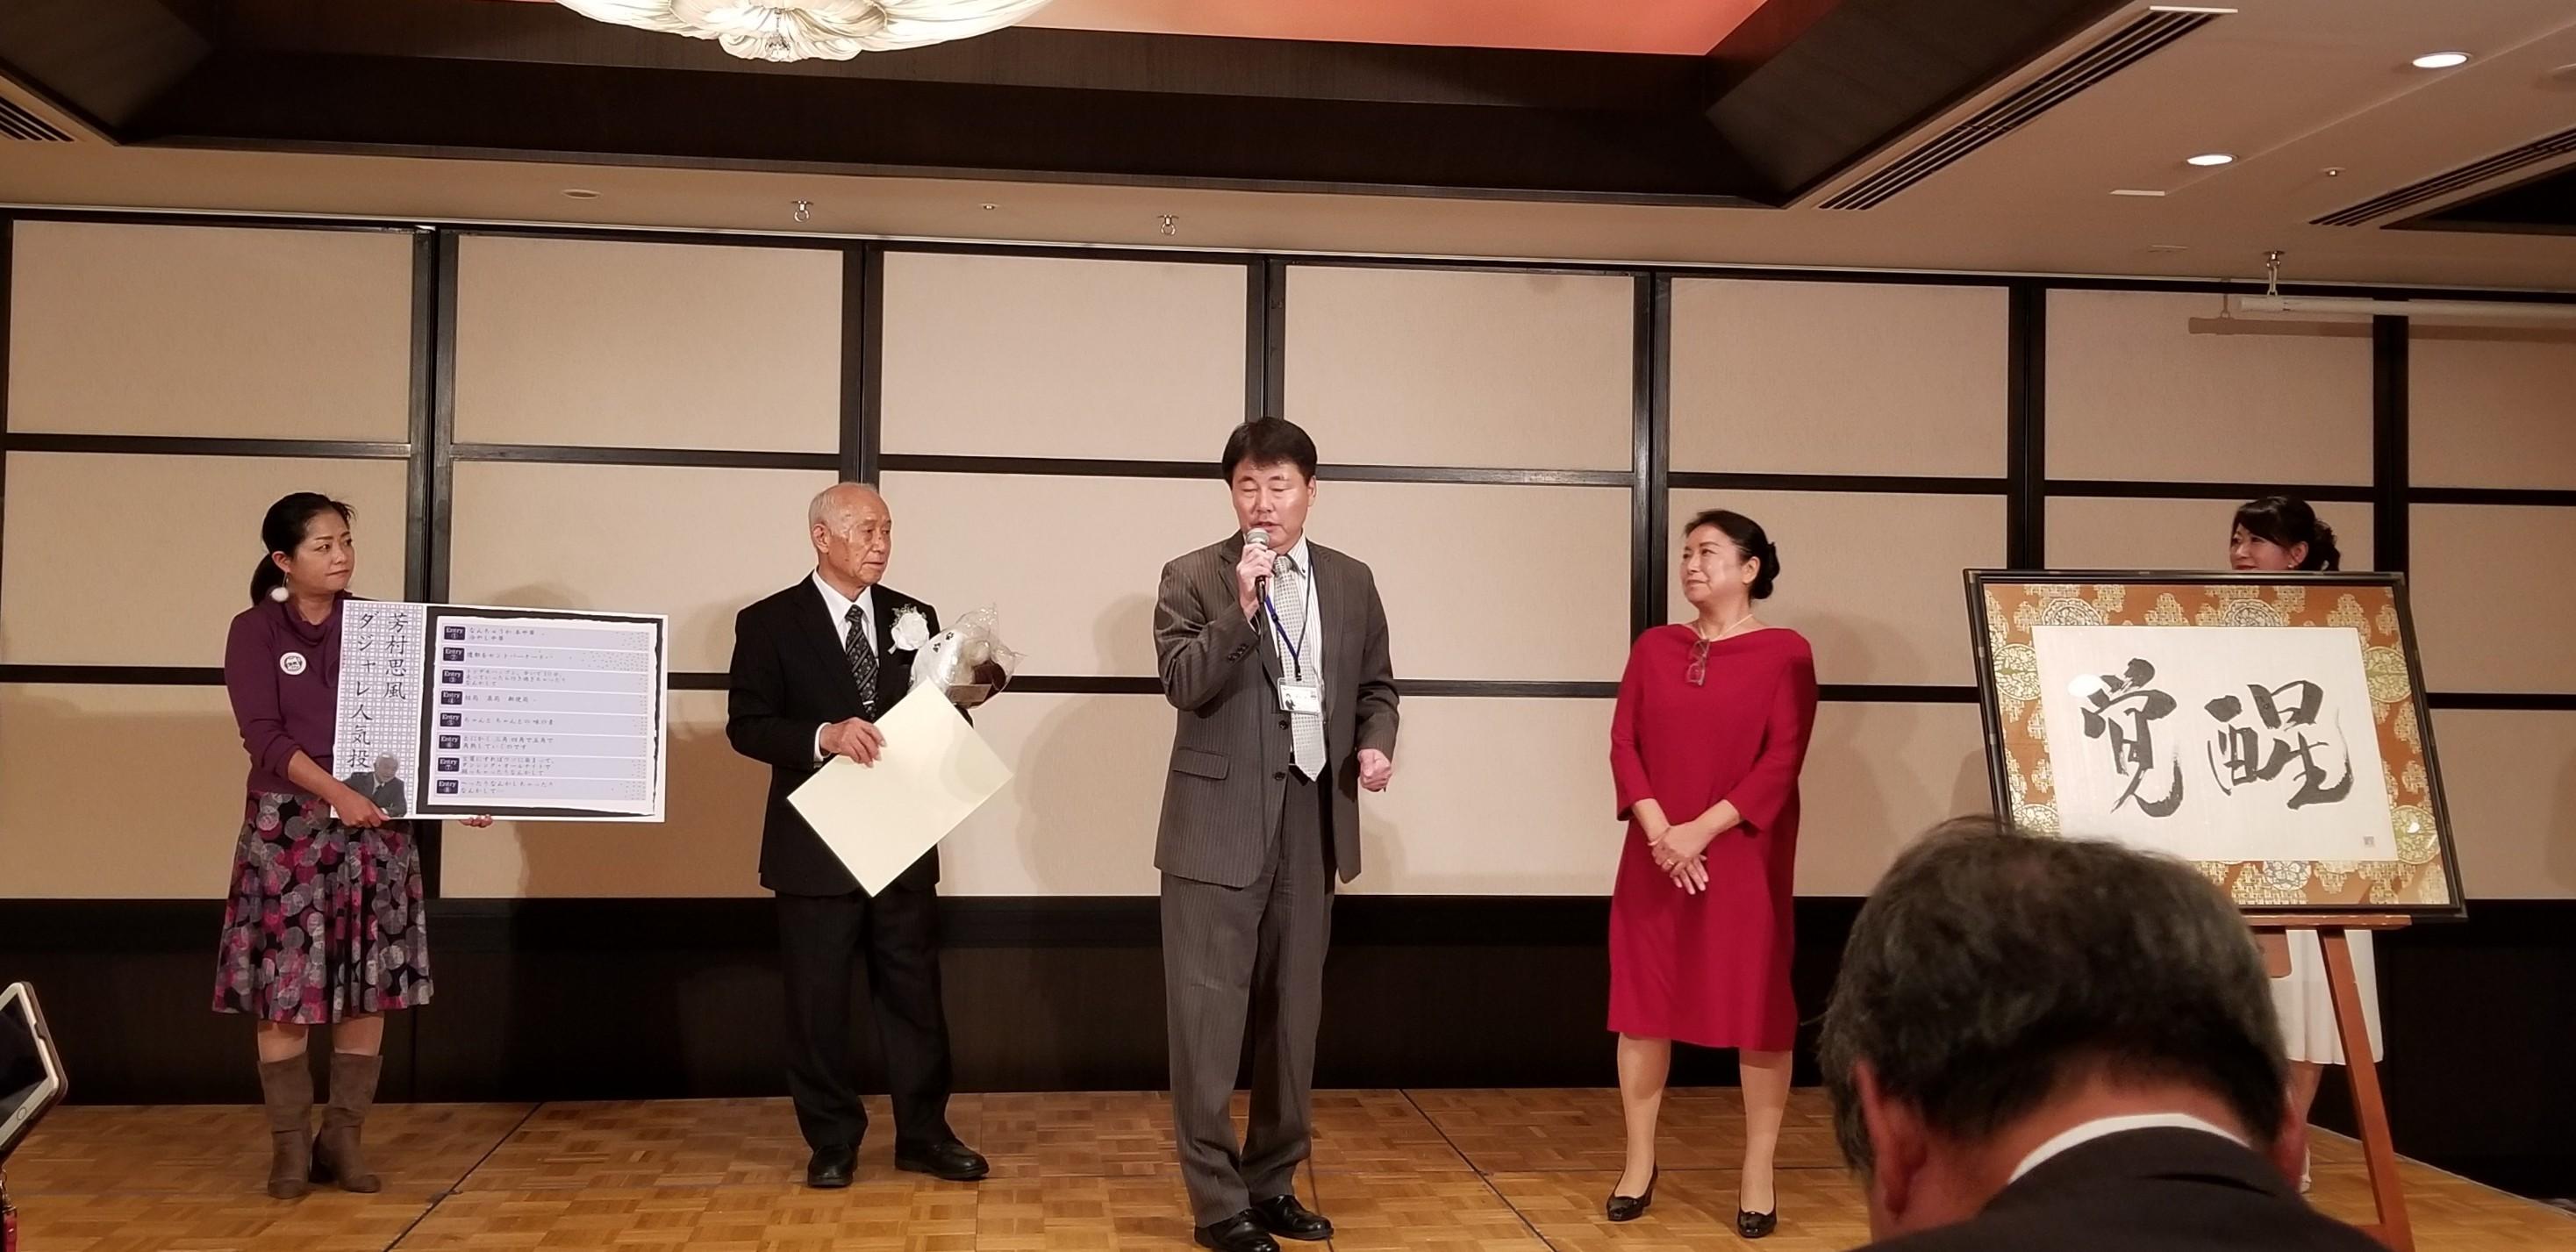 f3247d233f331a9c4f62bb11e193b231 - 第6回思風会全国大会2018in東京開催